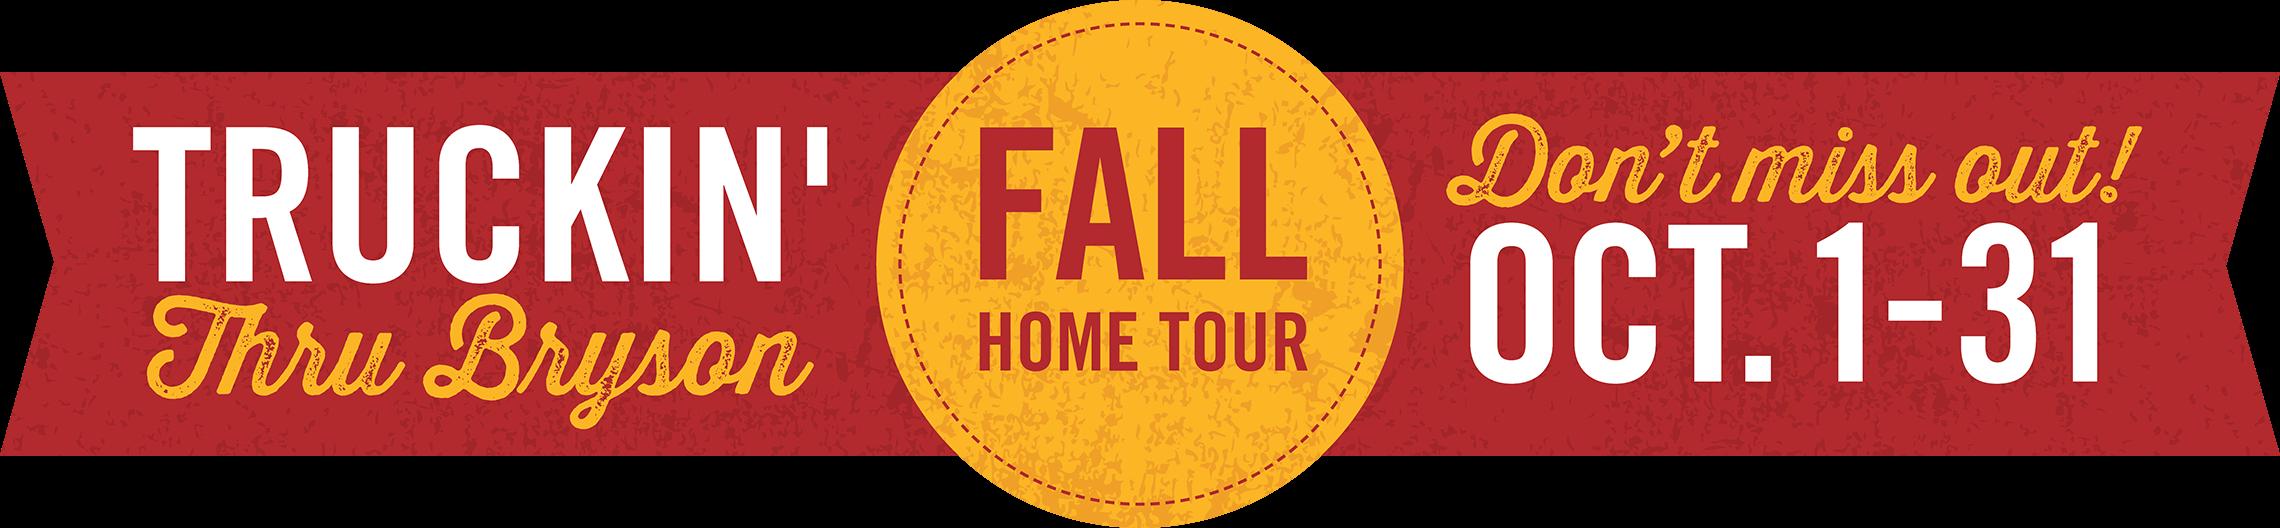 Truckin' Thru Bryson - Fall Home Tour - Don't Miss Out! Oct. 1-31